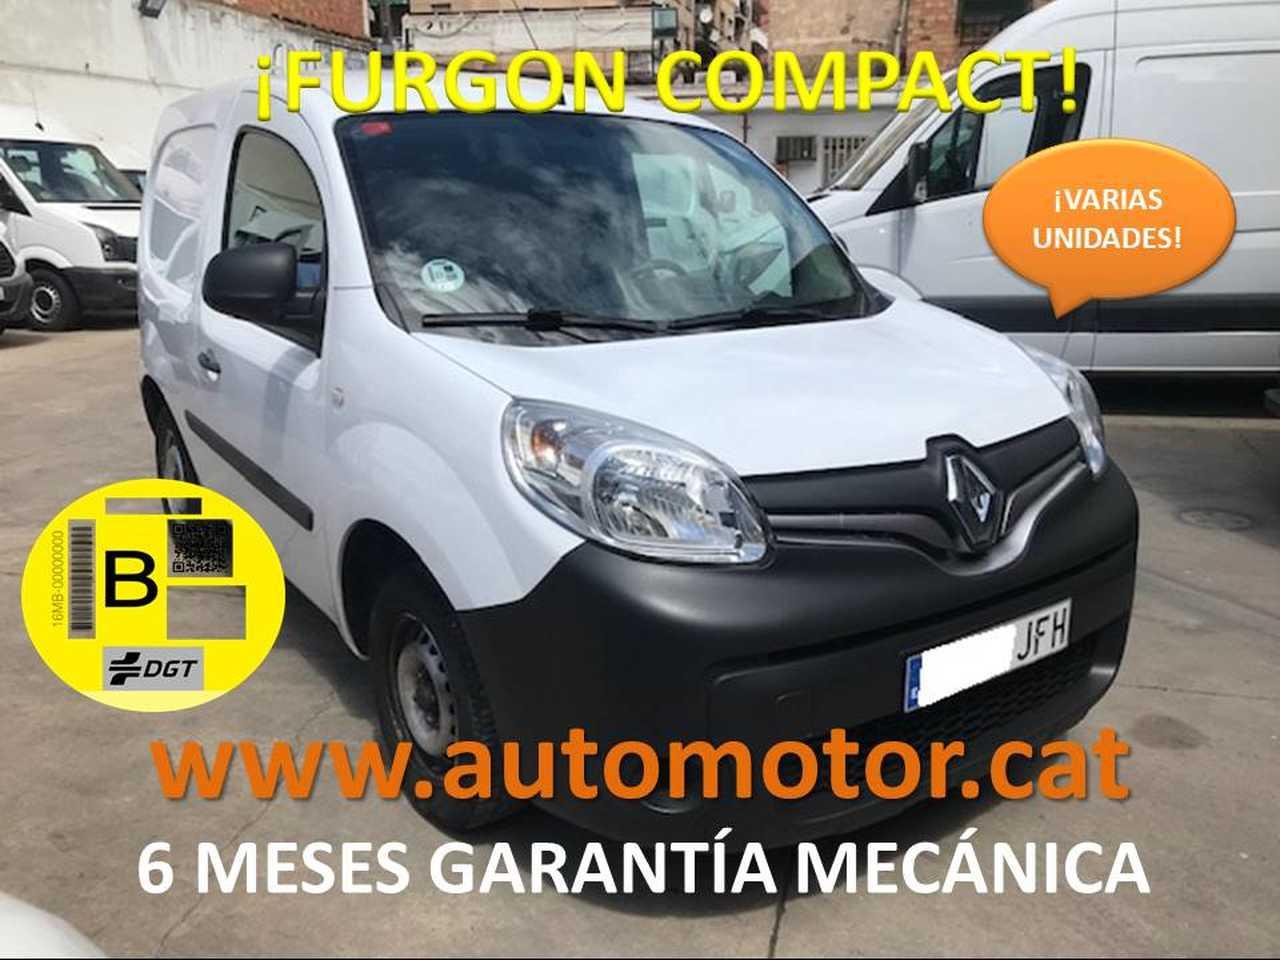 Renault Kangoo Fg. Compact 1.5dCi Prof. 75 E5 Profesional - GARANTIA MECANICA  - Foto 1